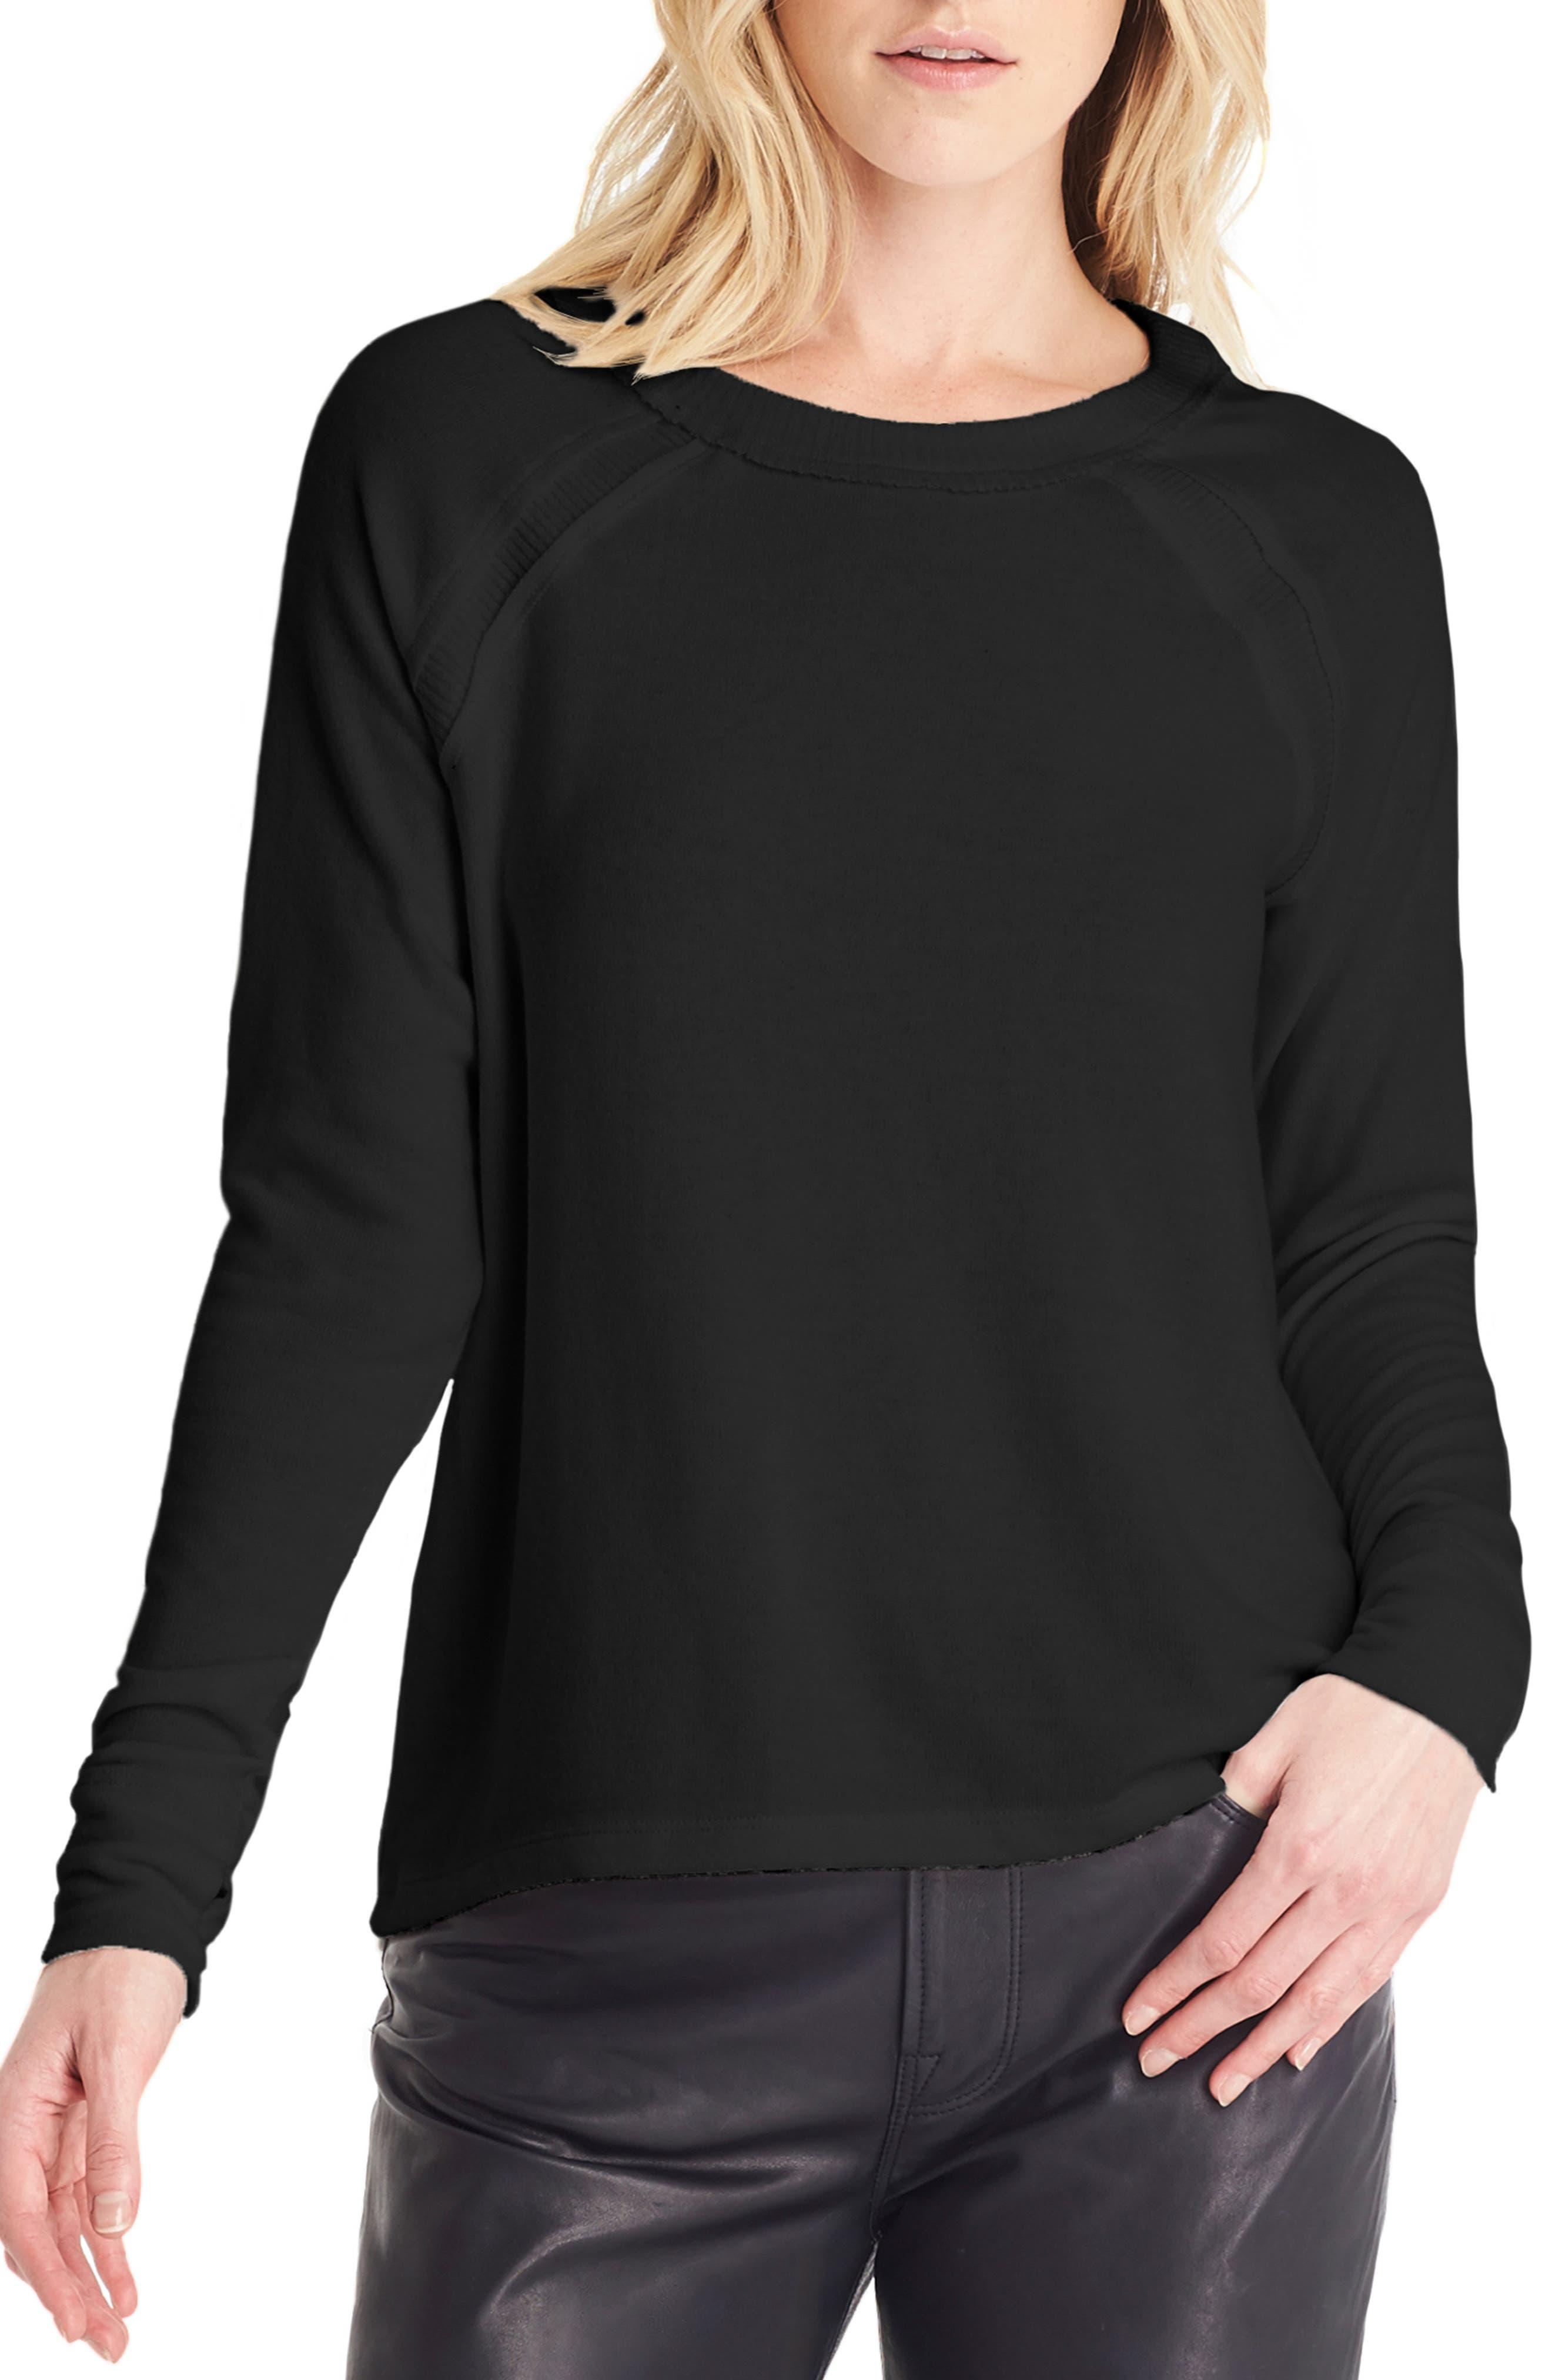 Thumbhole Sleeve Top,                         Main,                         color, 001